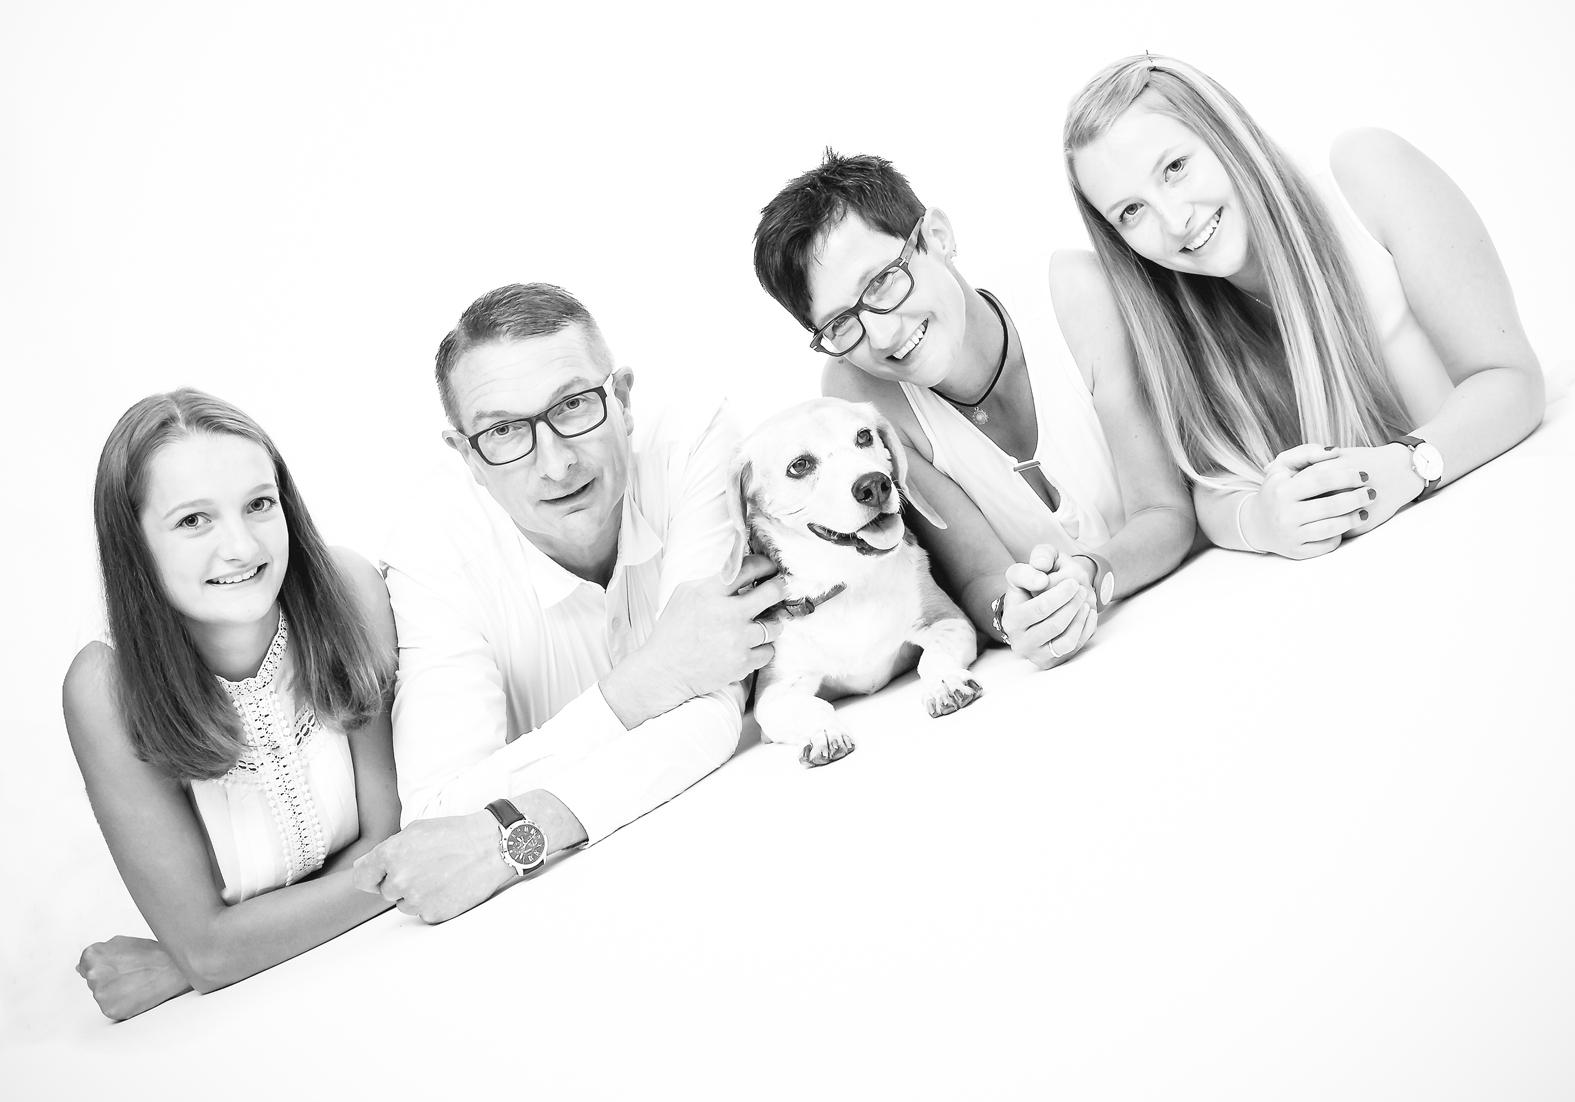 Familienbilder, Familienfotografie, Kinderfotografie, Outdoorfotografie, Kirsten Hedemann Fotografie, Baby und Familienfotografie Nordenham